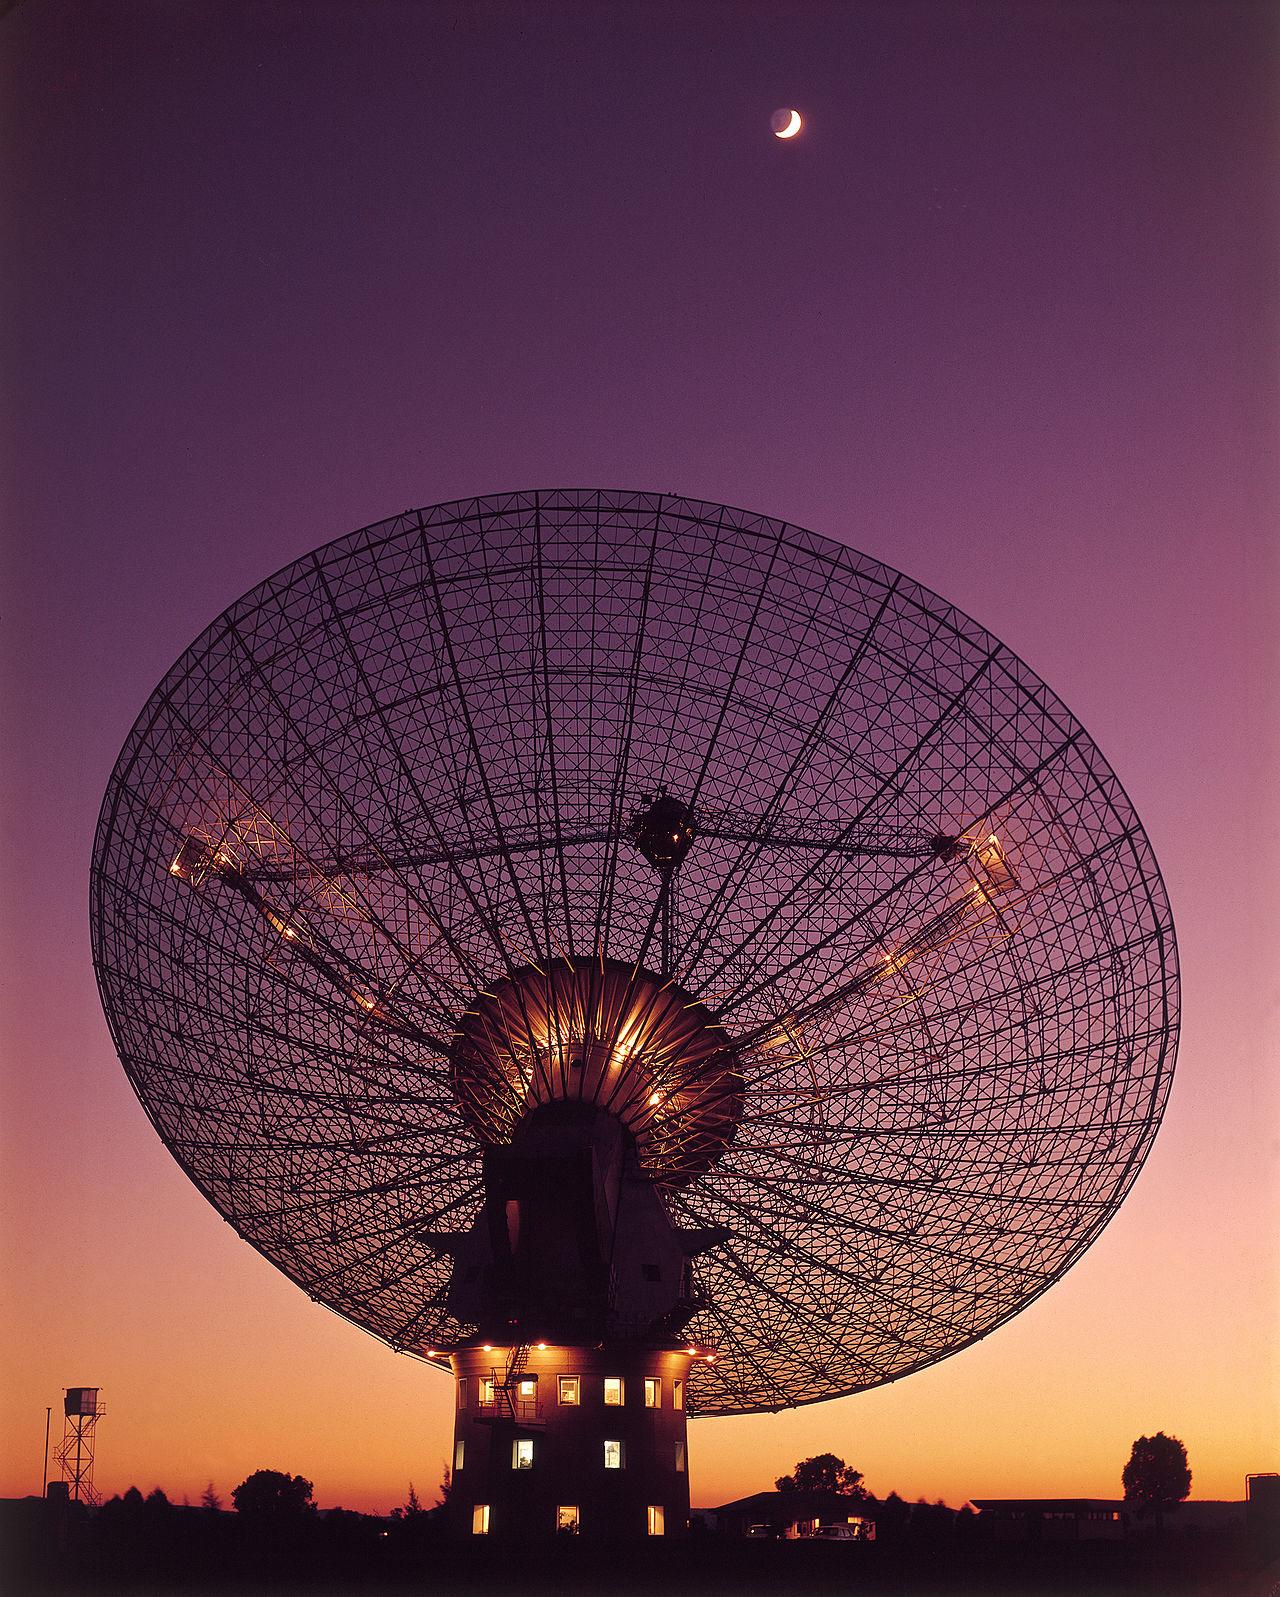 Parkes radio telescope in New South Wales, Australia.  Credit: CSIRO